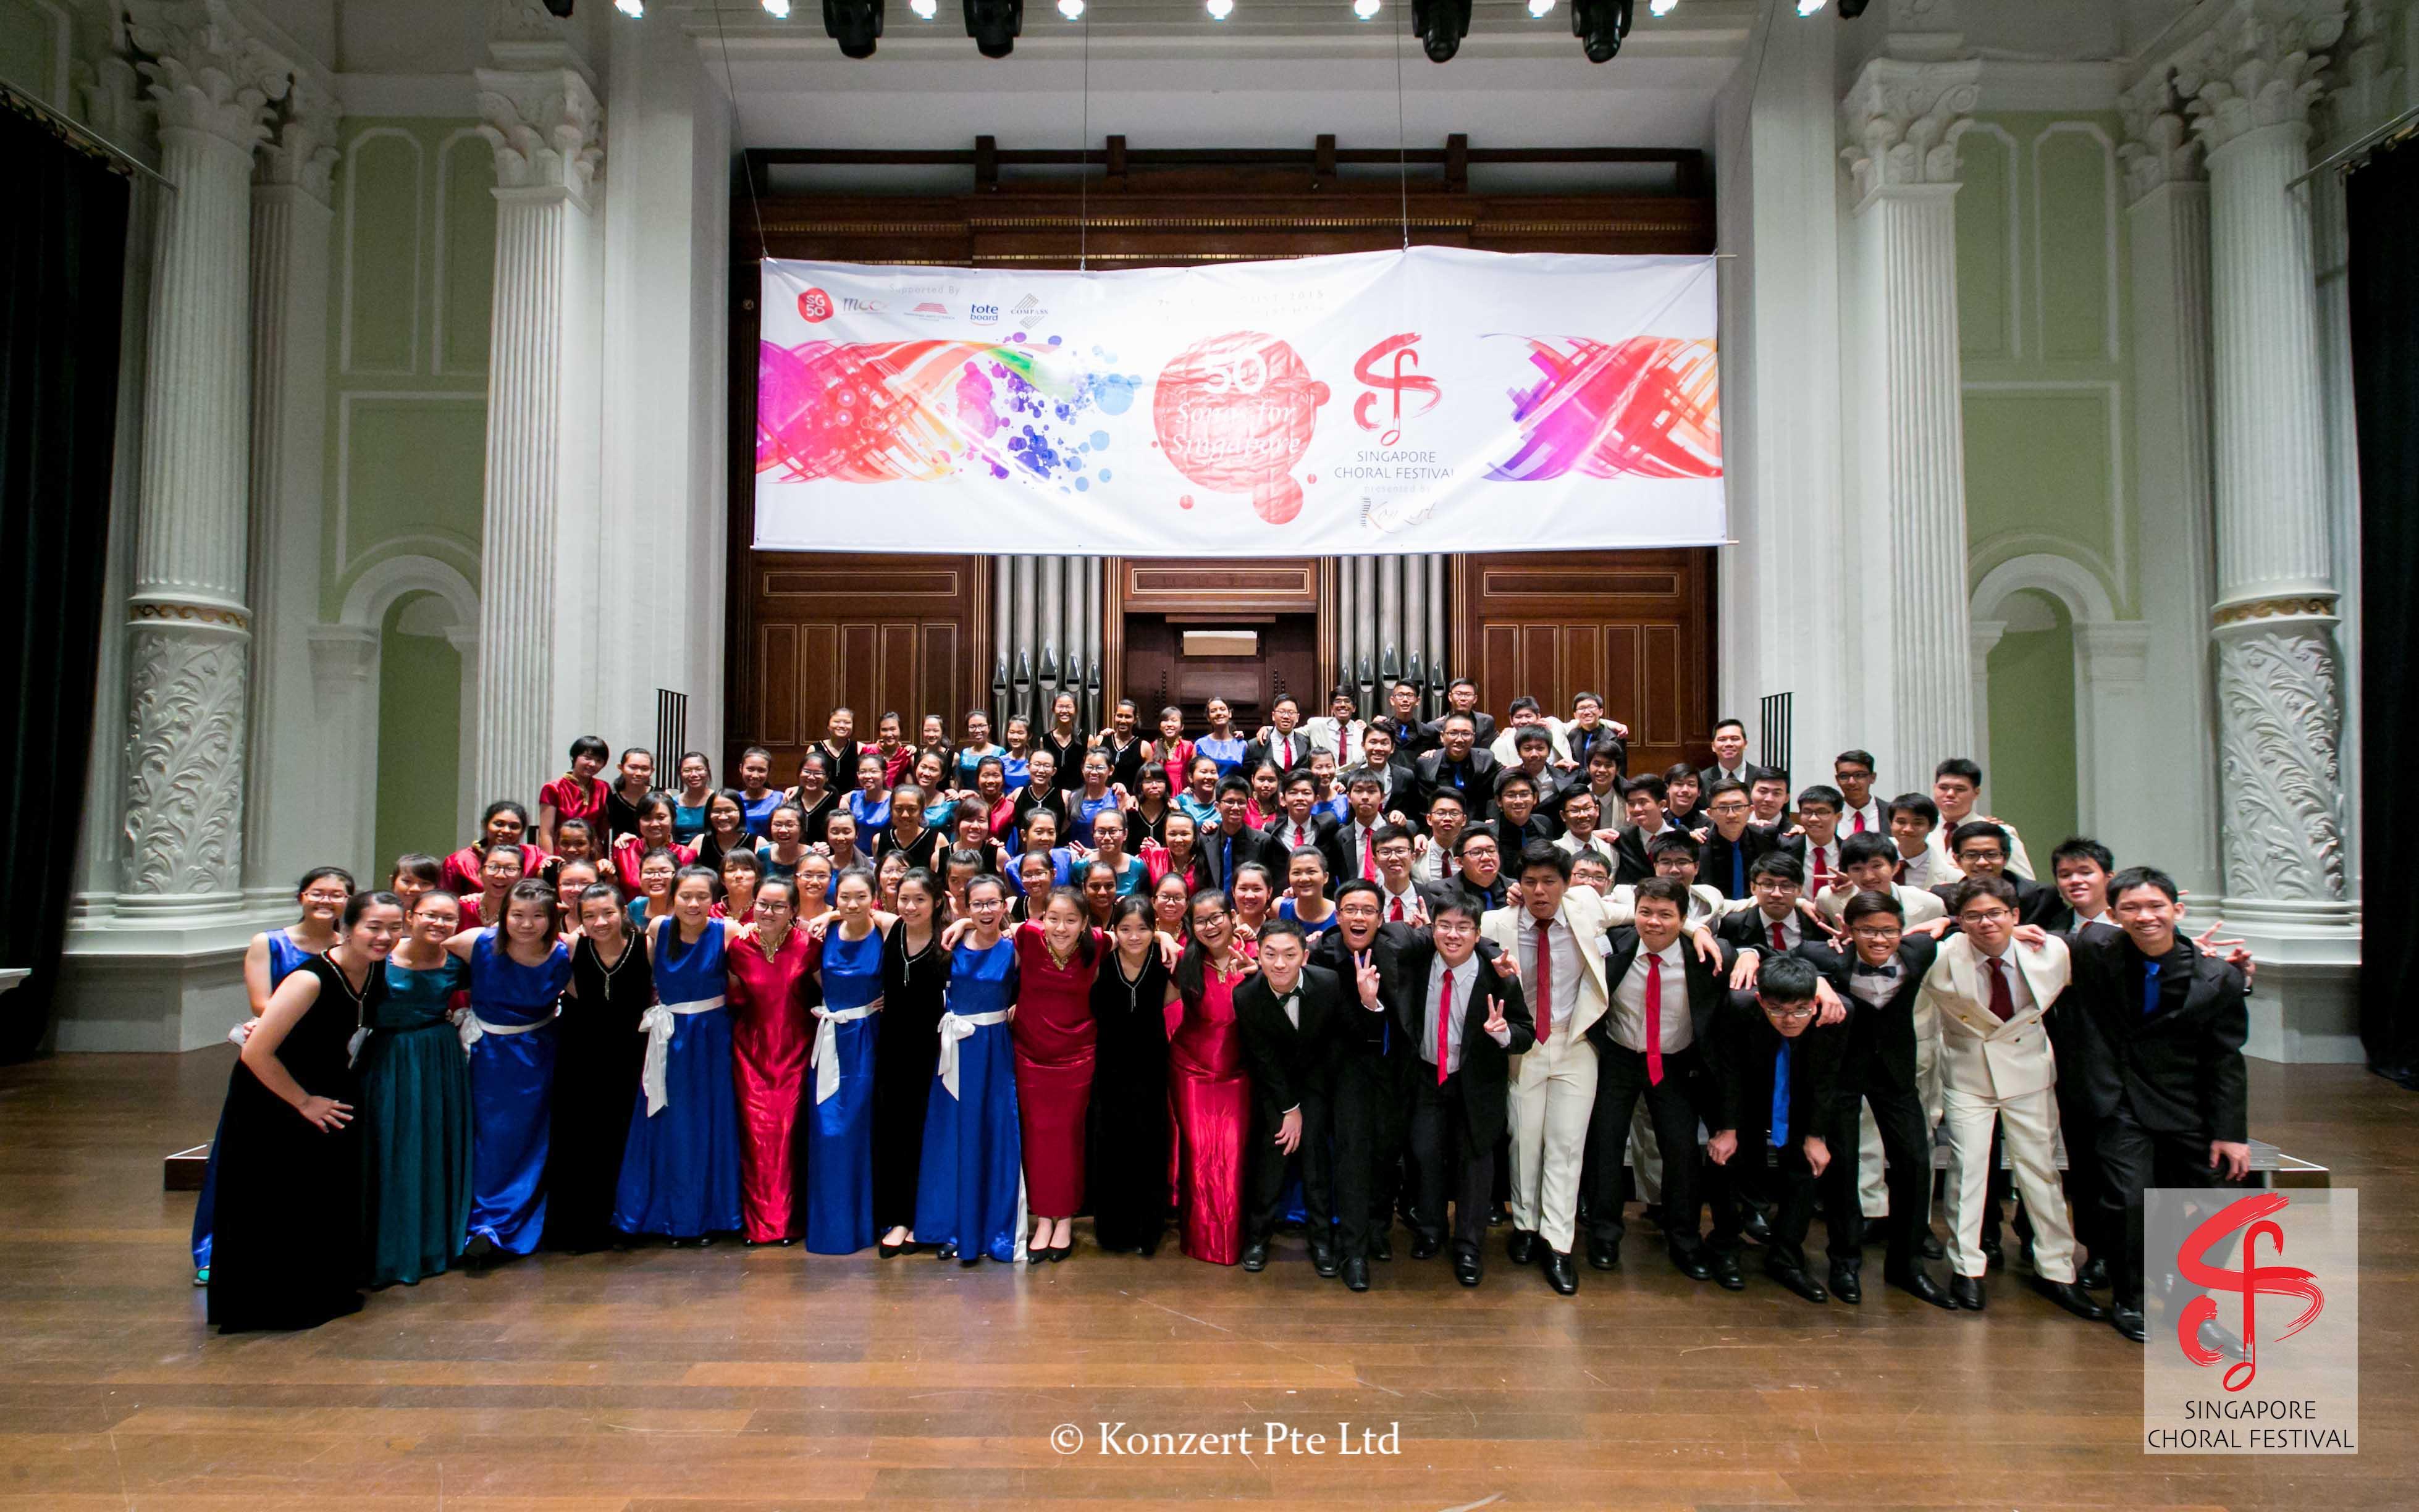 Singapore Choral Festival 7-8-15 (186).jpg